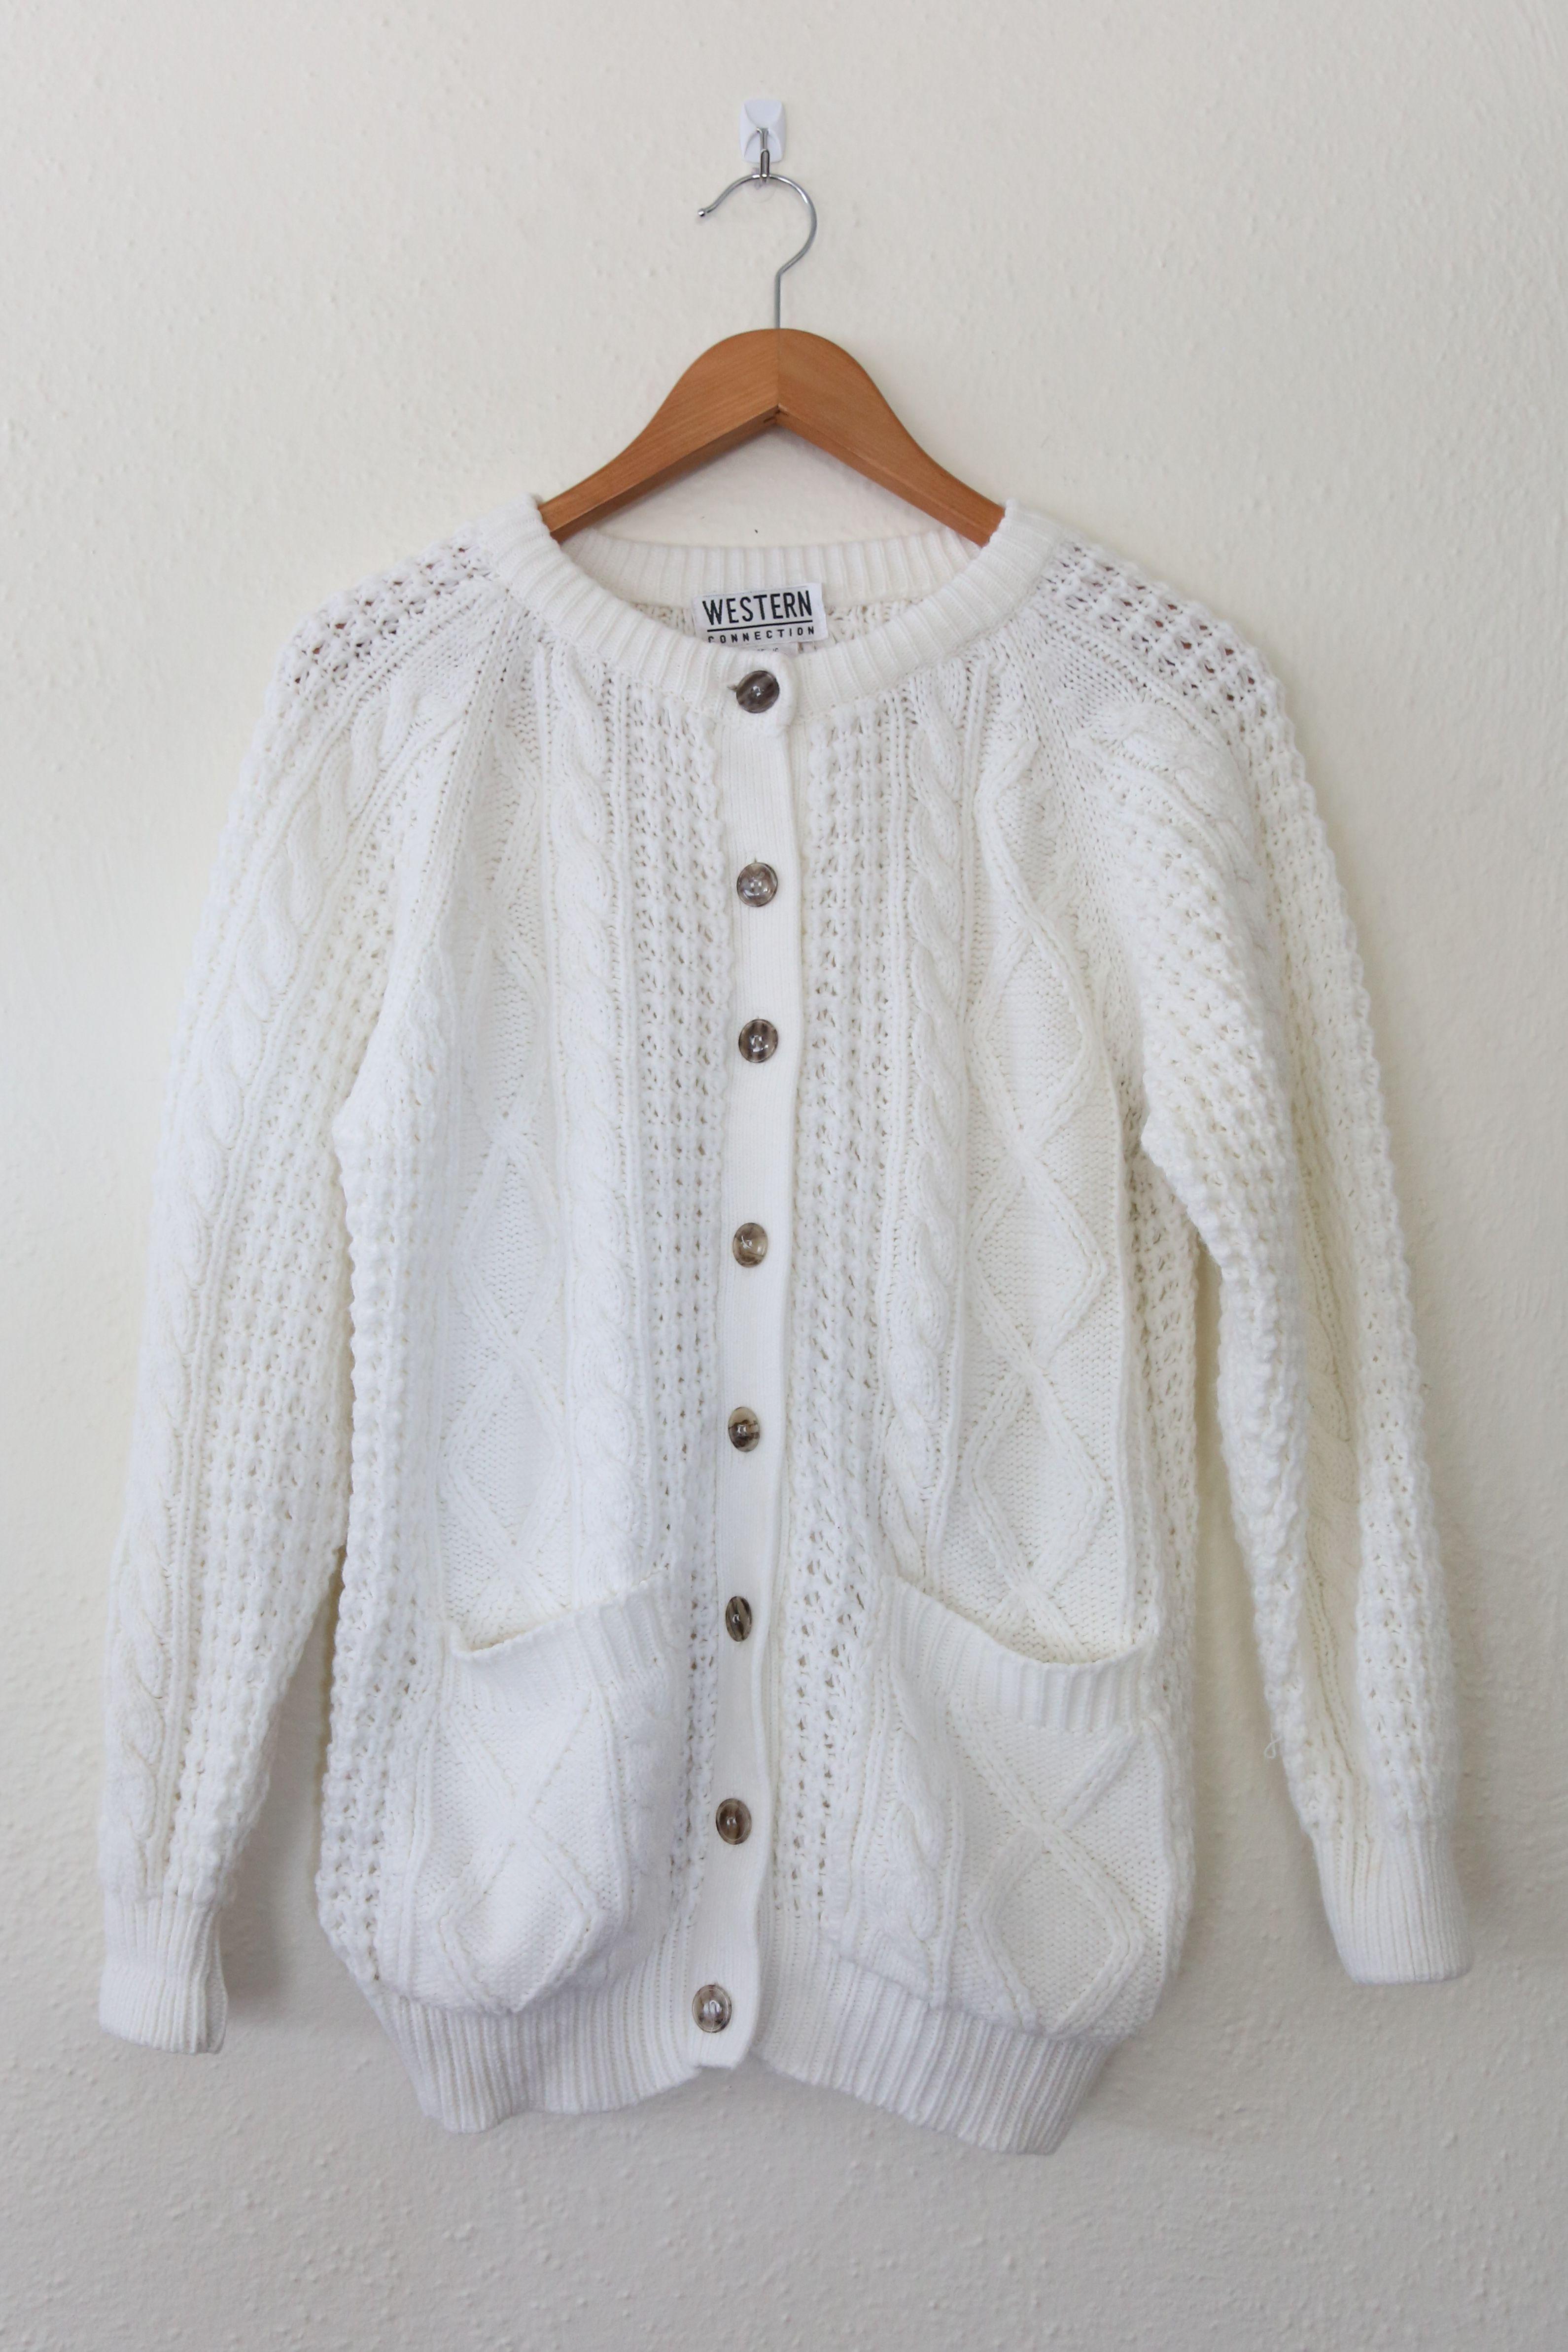 Flourish Vintage Fisherman's Knit Cardigan/ Baggy Cardigan Cable ...